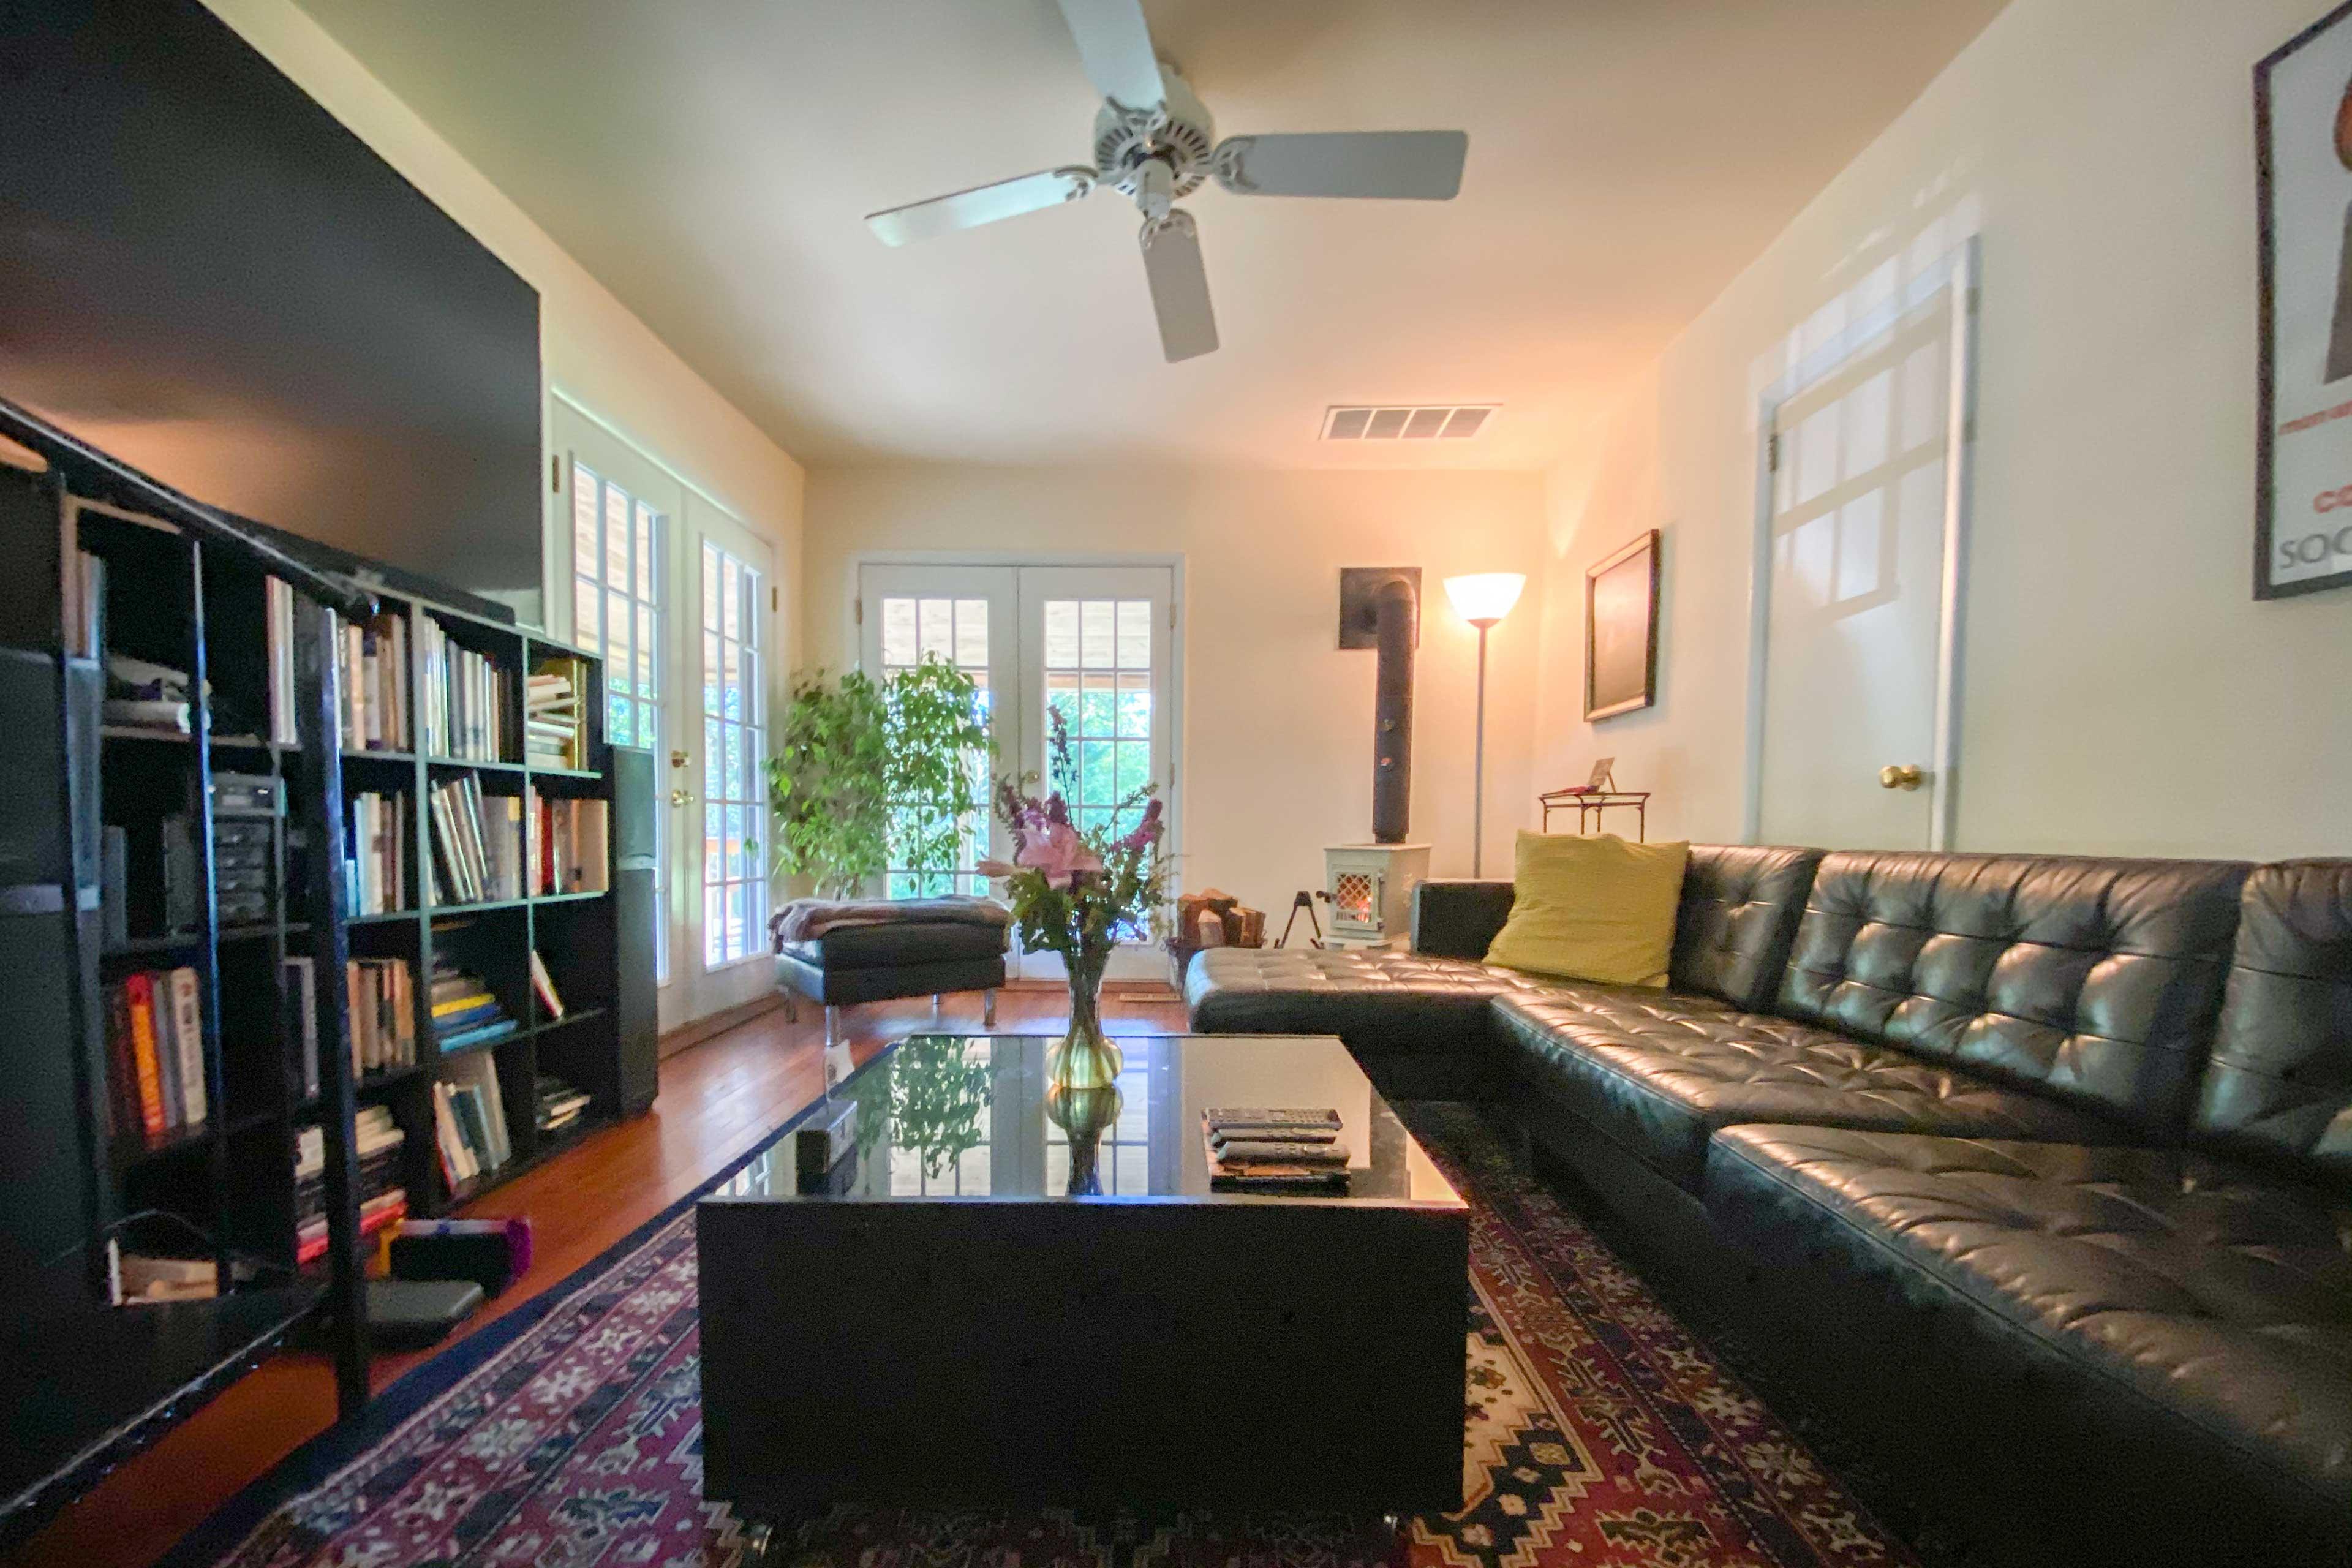 Modern Interior | Smart TV | Wood-Burning Fireplace